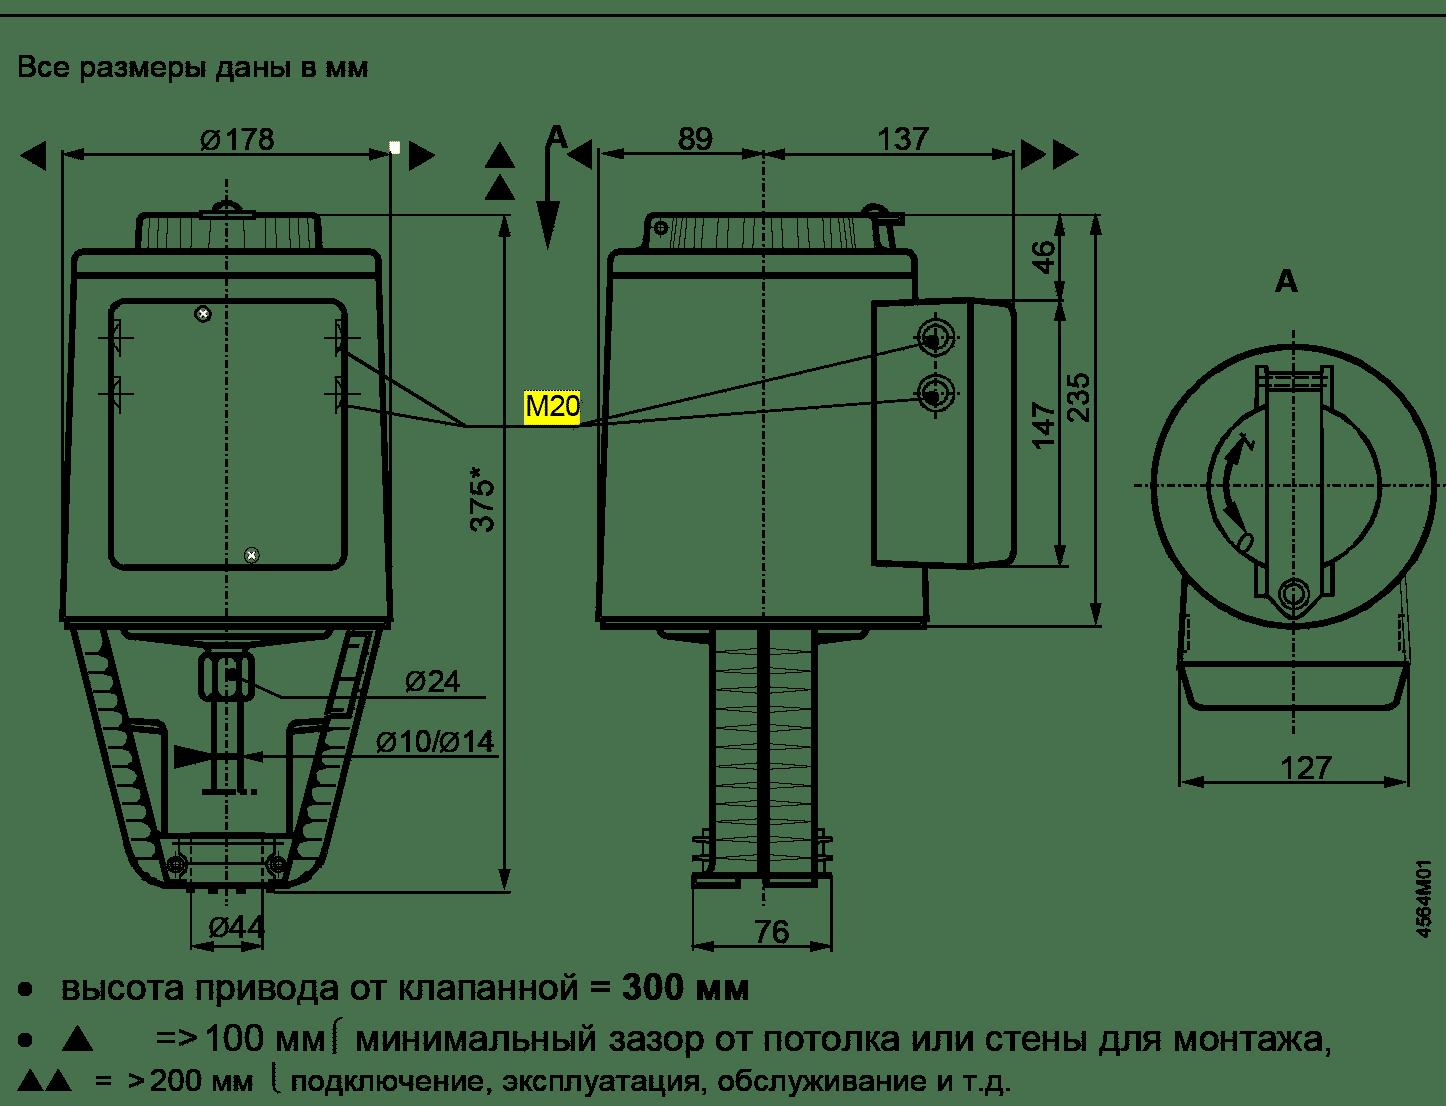 Siemens SKB размеры